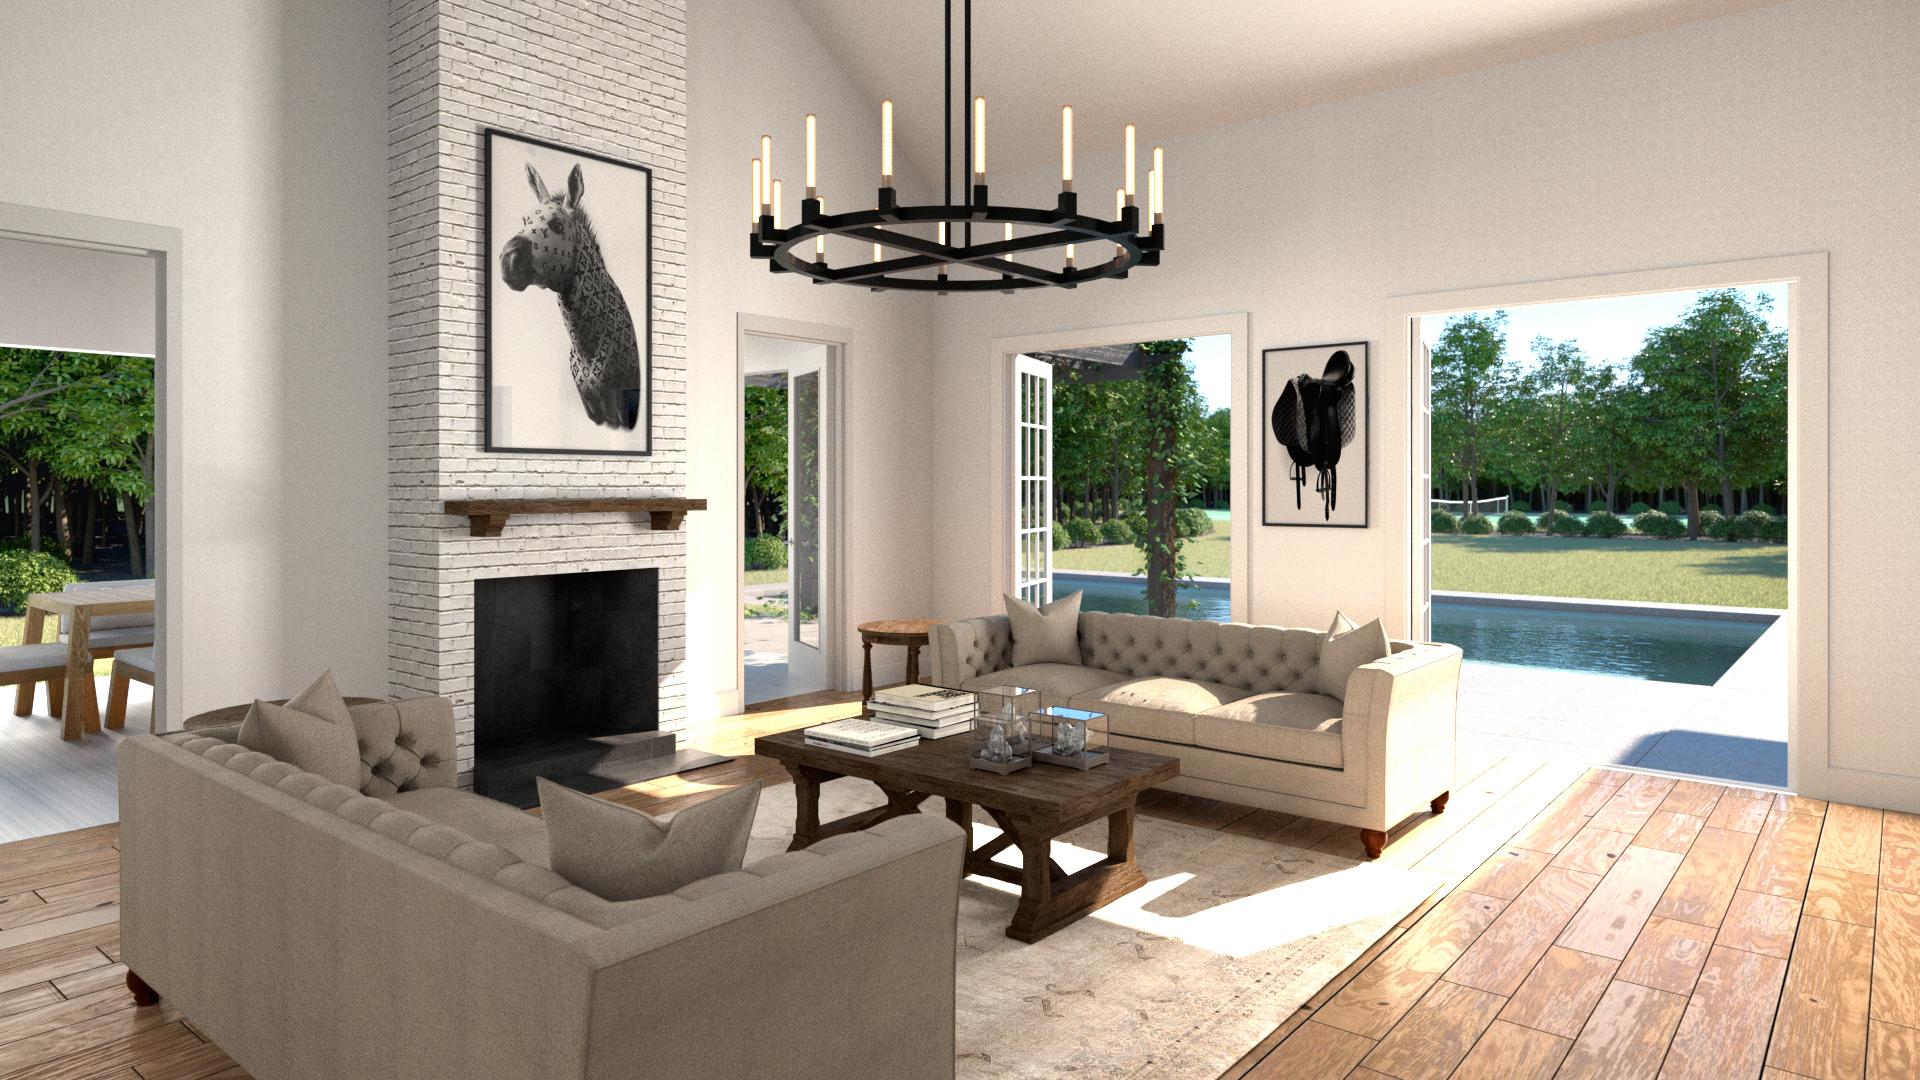 DB-rendering-interior-residential-family-room-2018-01-hamptons